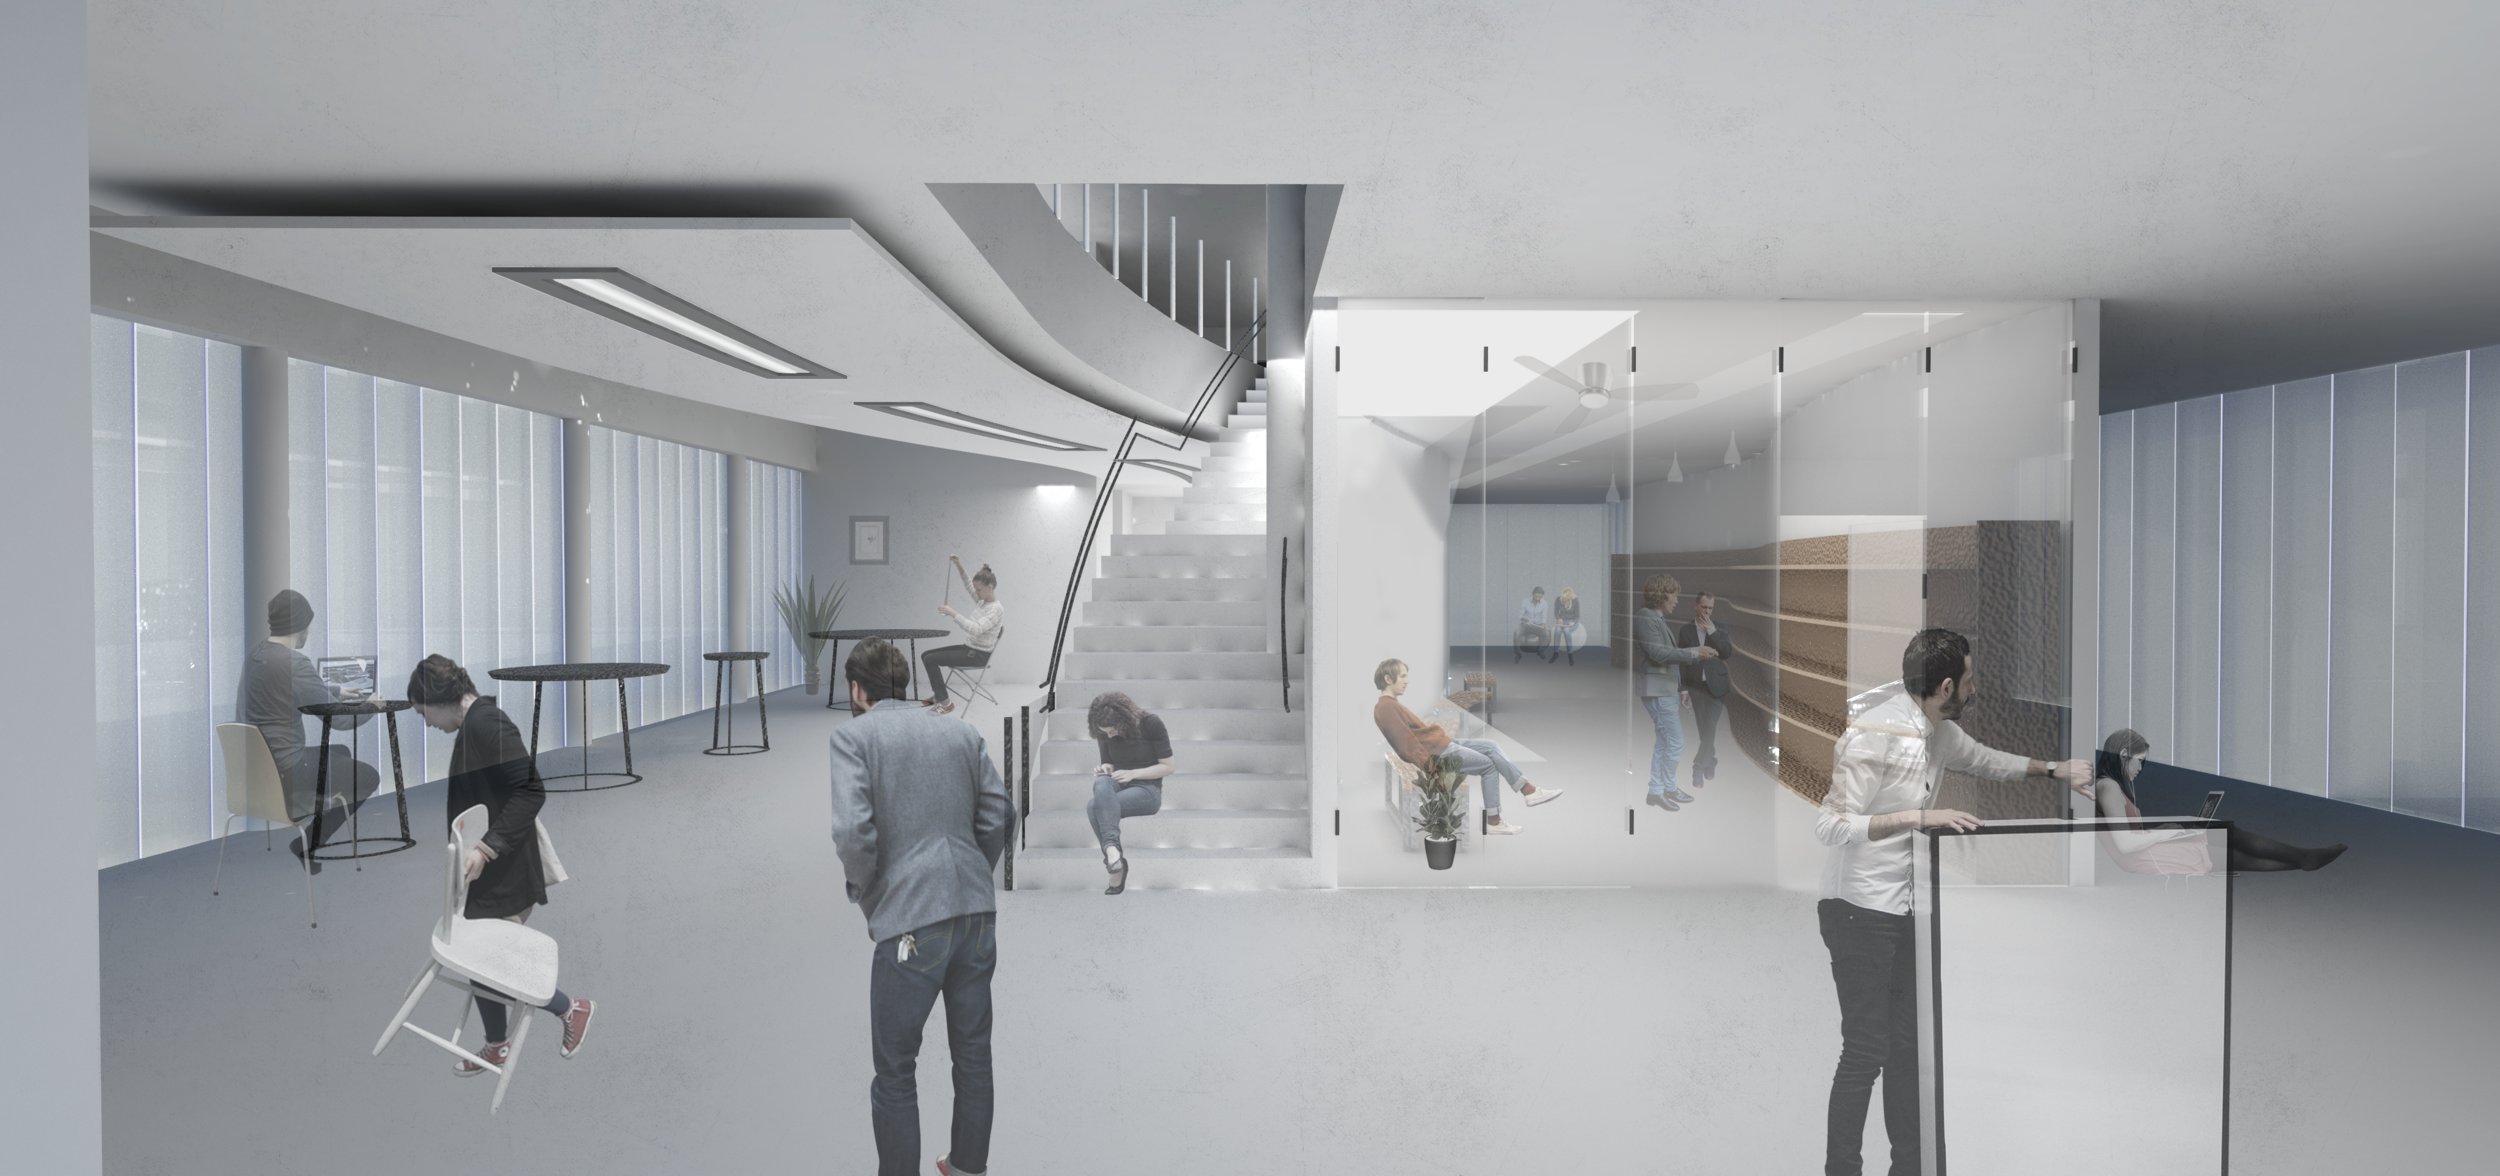 interior rendering 3.0.png